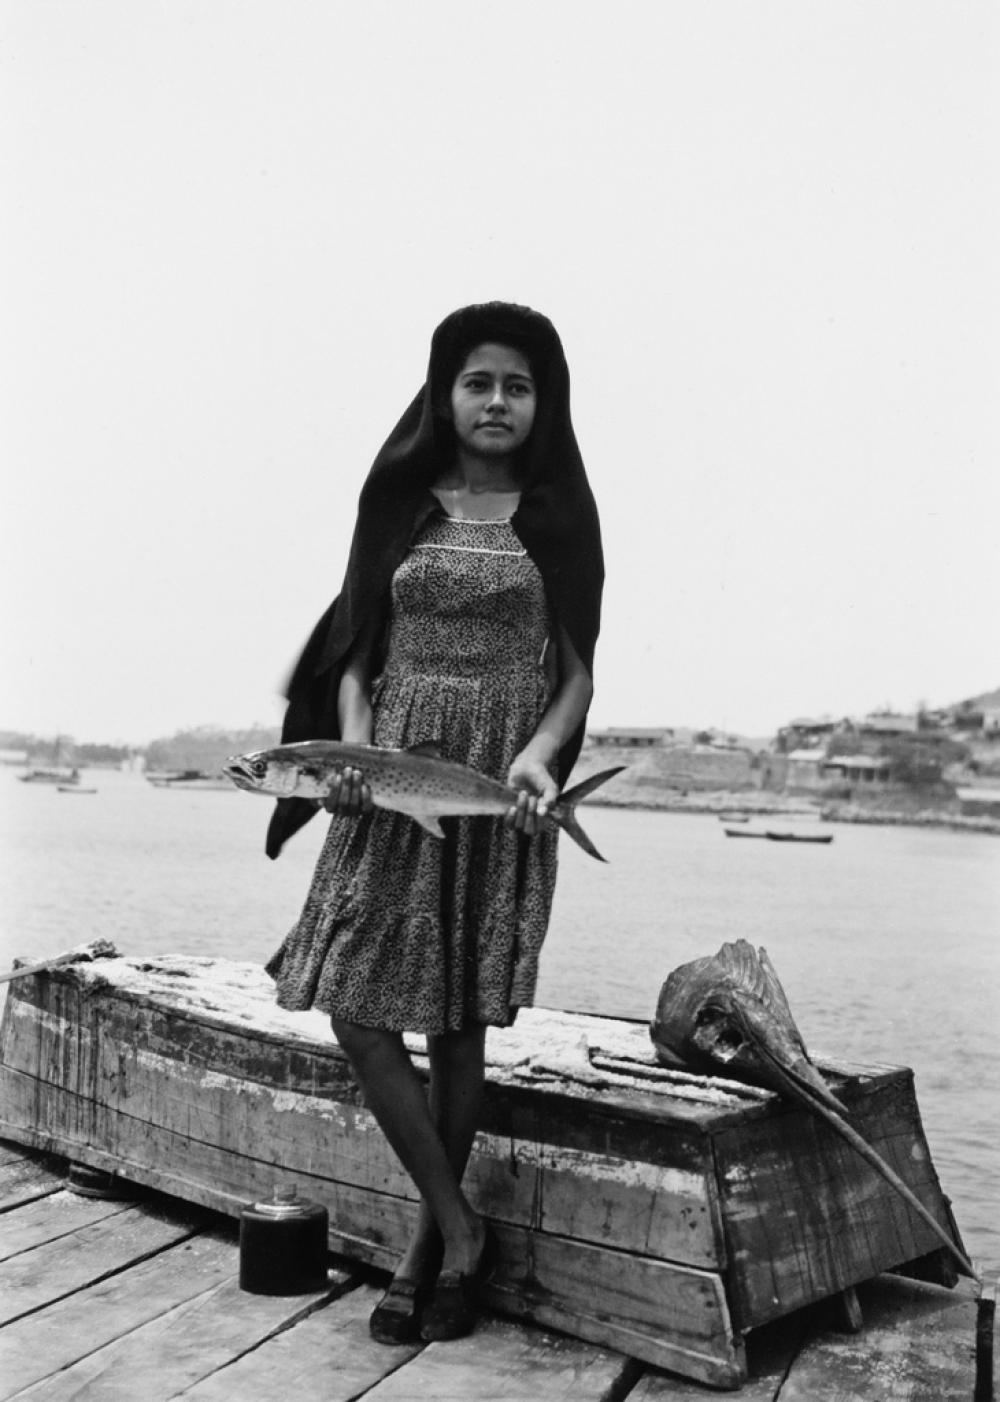 MANUEL ALVAREZ BRAVO (1902-2002) Un Pez que Llaman Sierra [A Fish Called Sword].